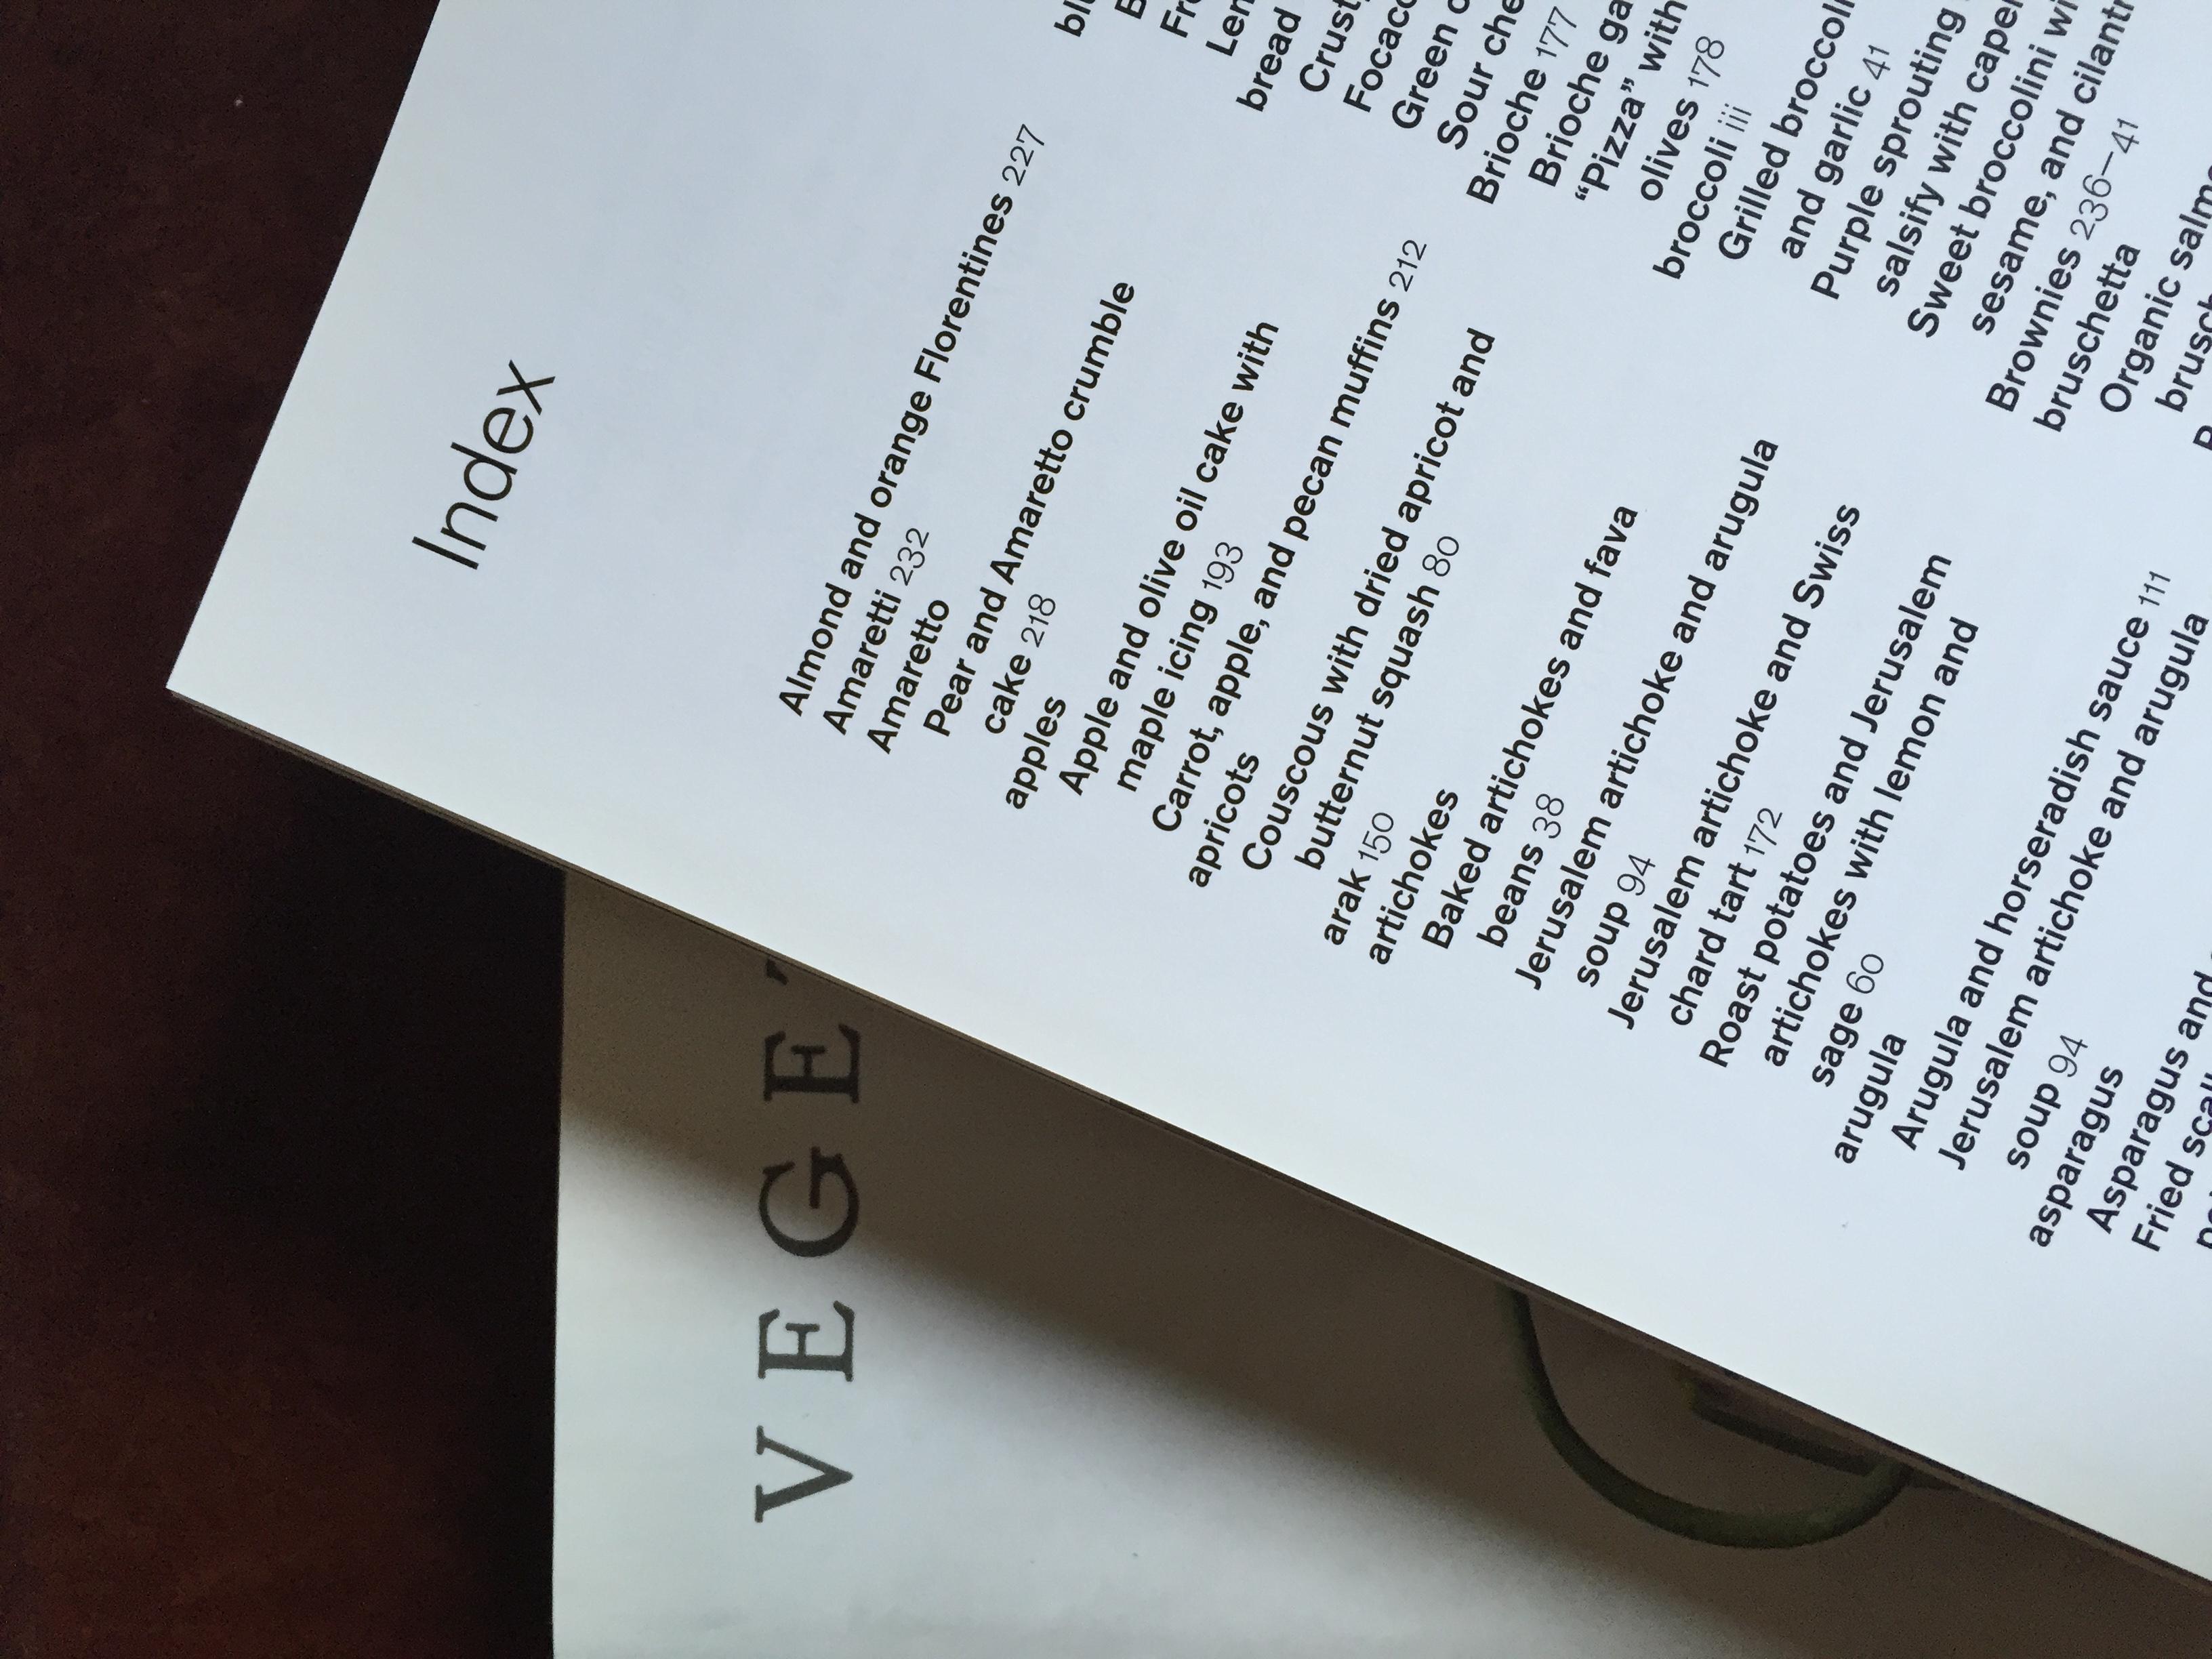 A cookbook index